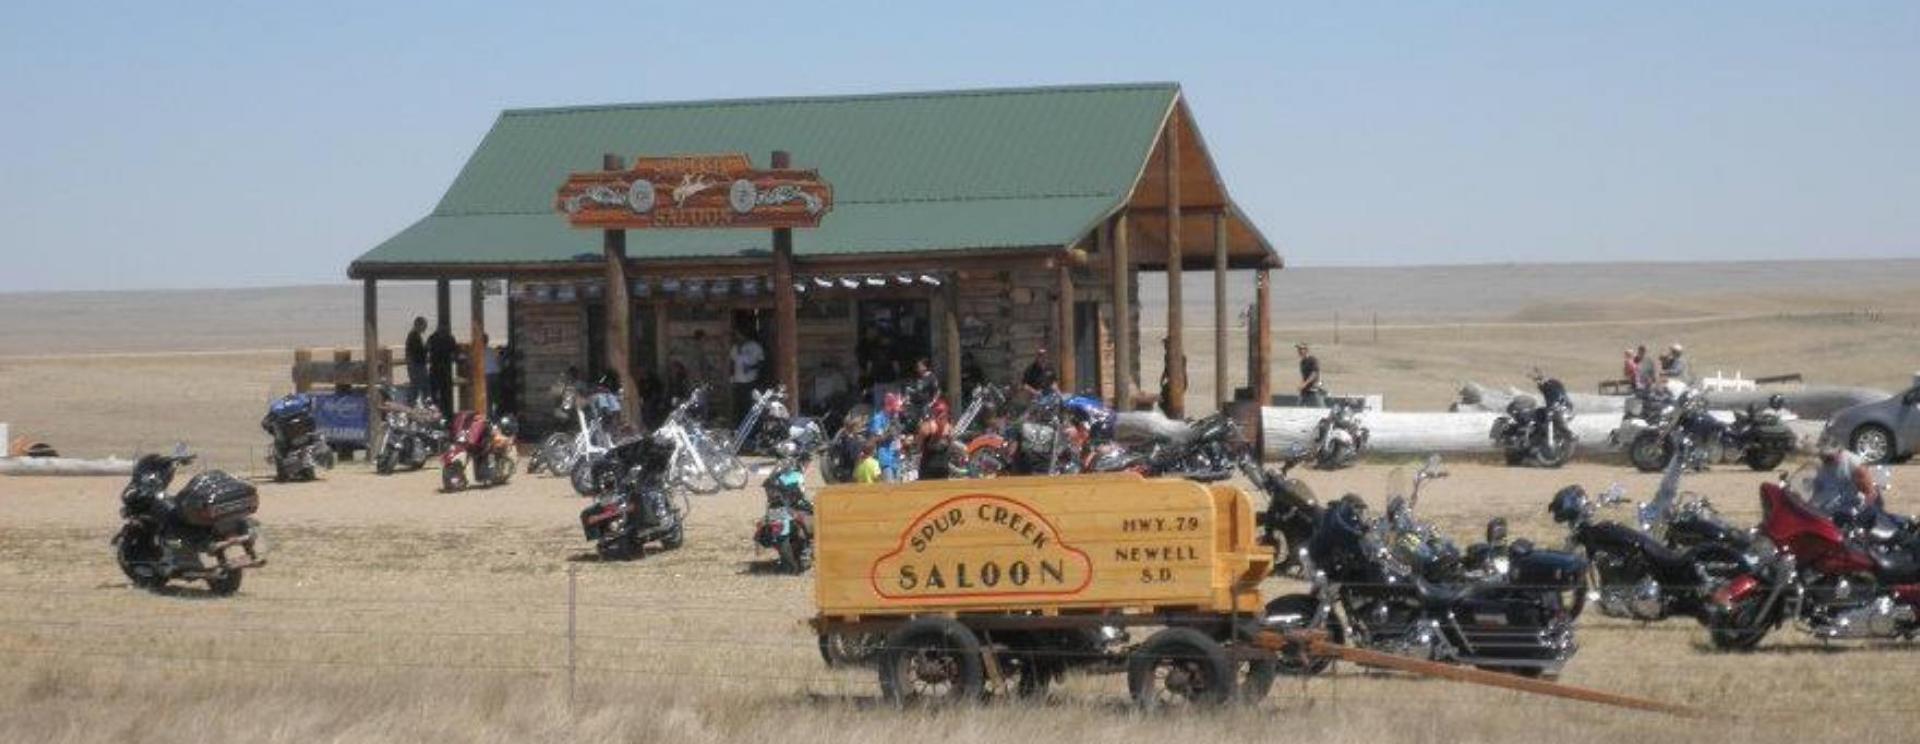 Spur Creek Saloon & Ranch